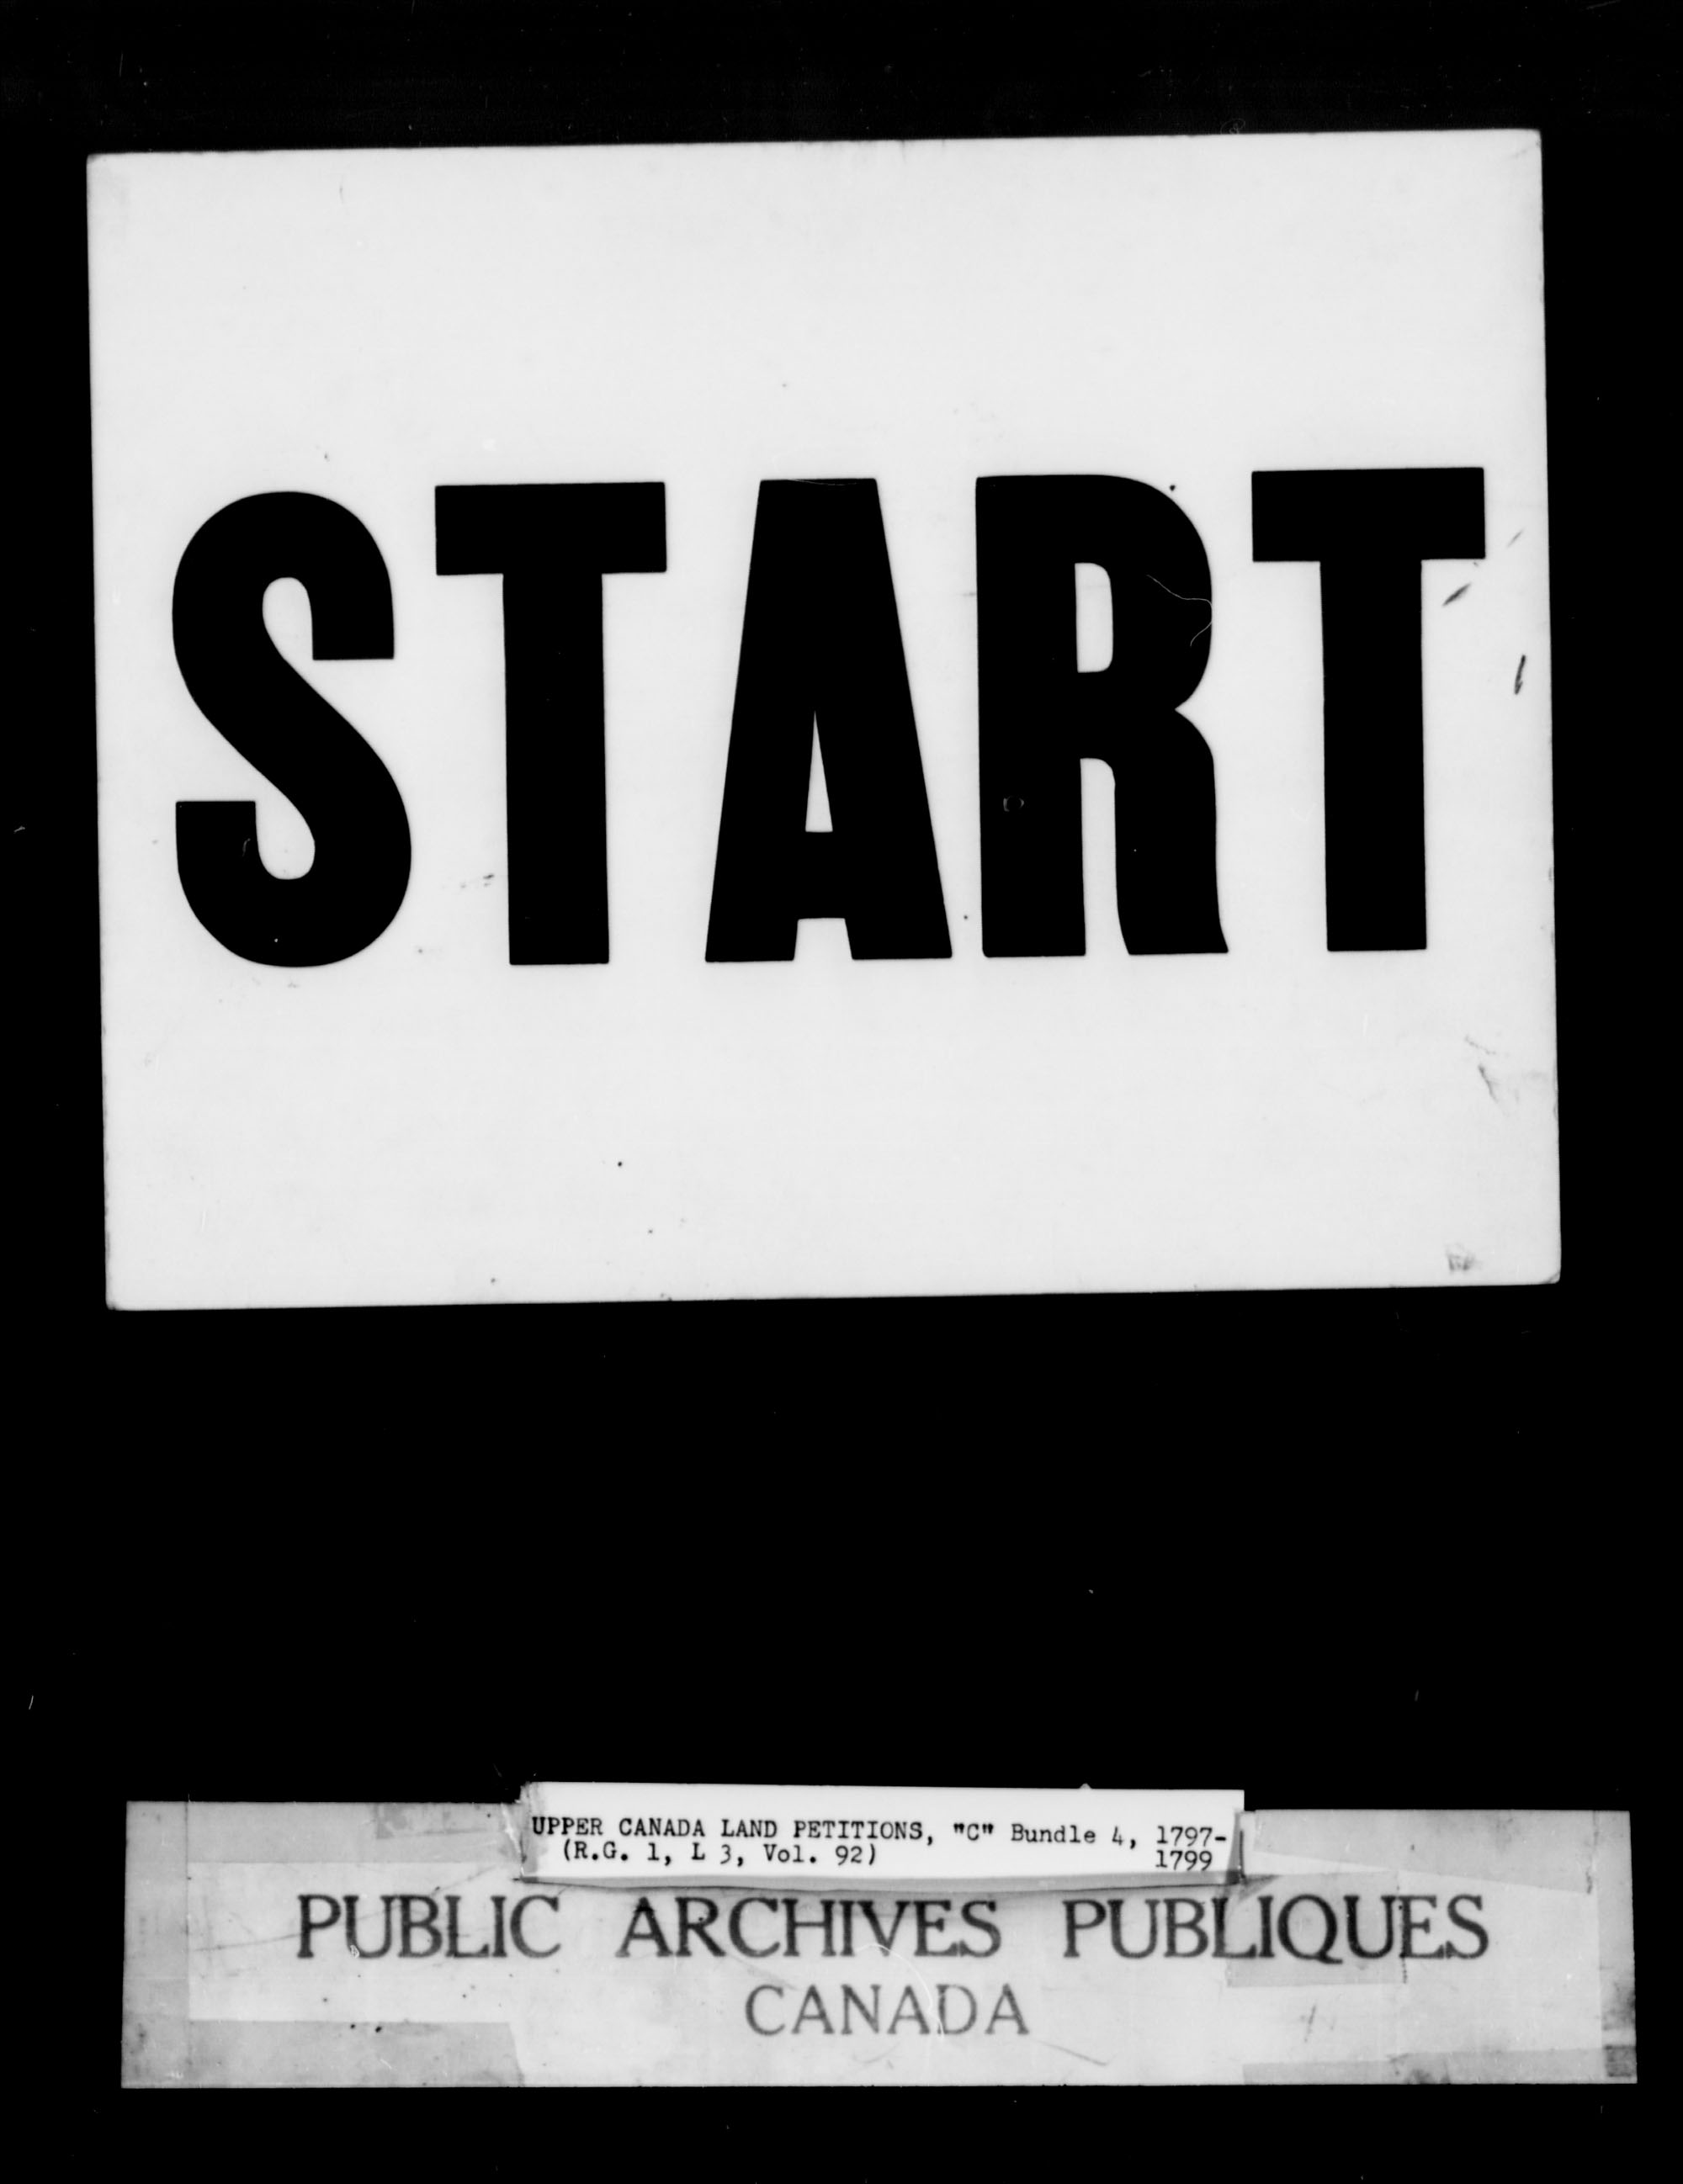 Titre: Demandes de terres du Haut-Canada (1763-1865) - N° d'enregistrement Mikan: 205131 - Microforme: c-1649